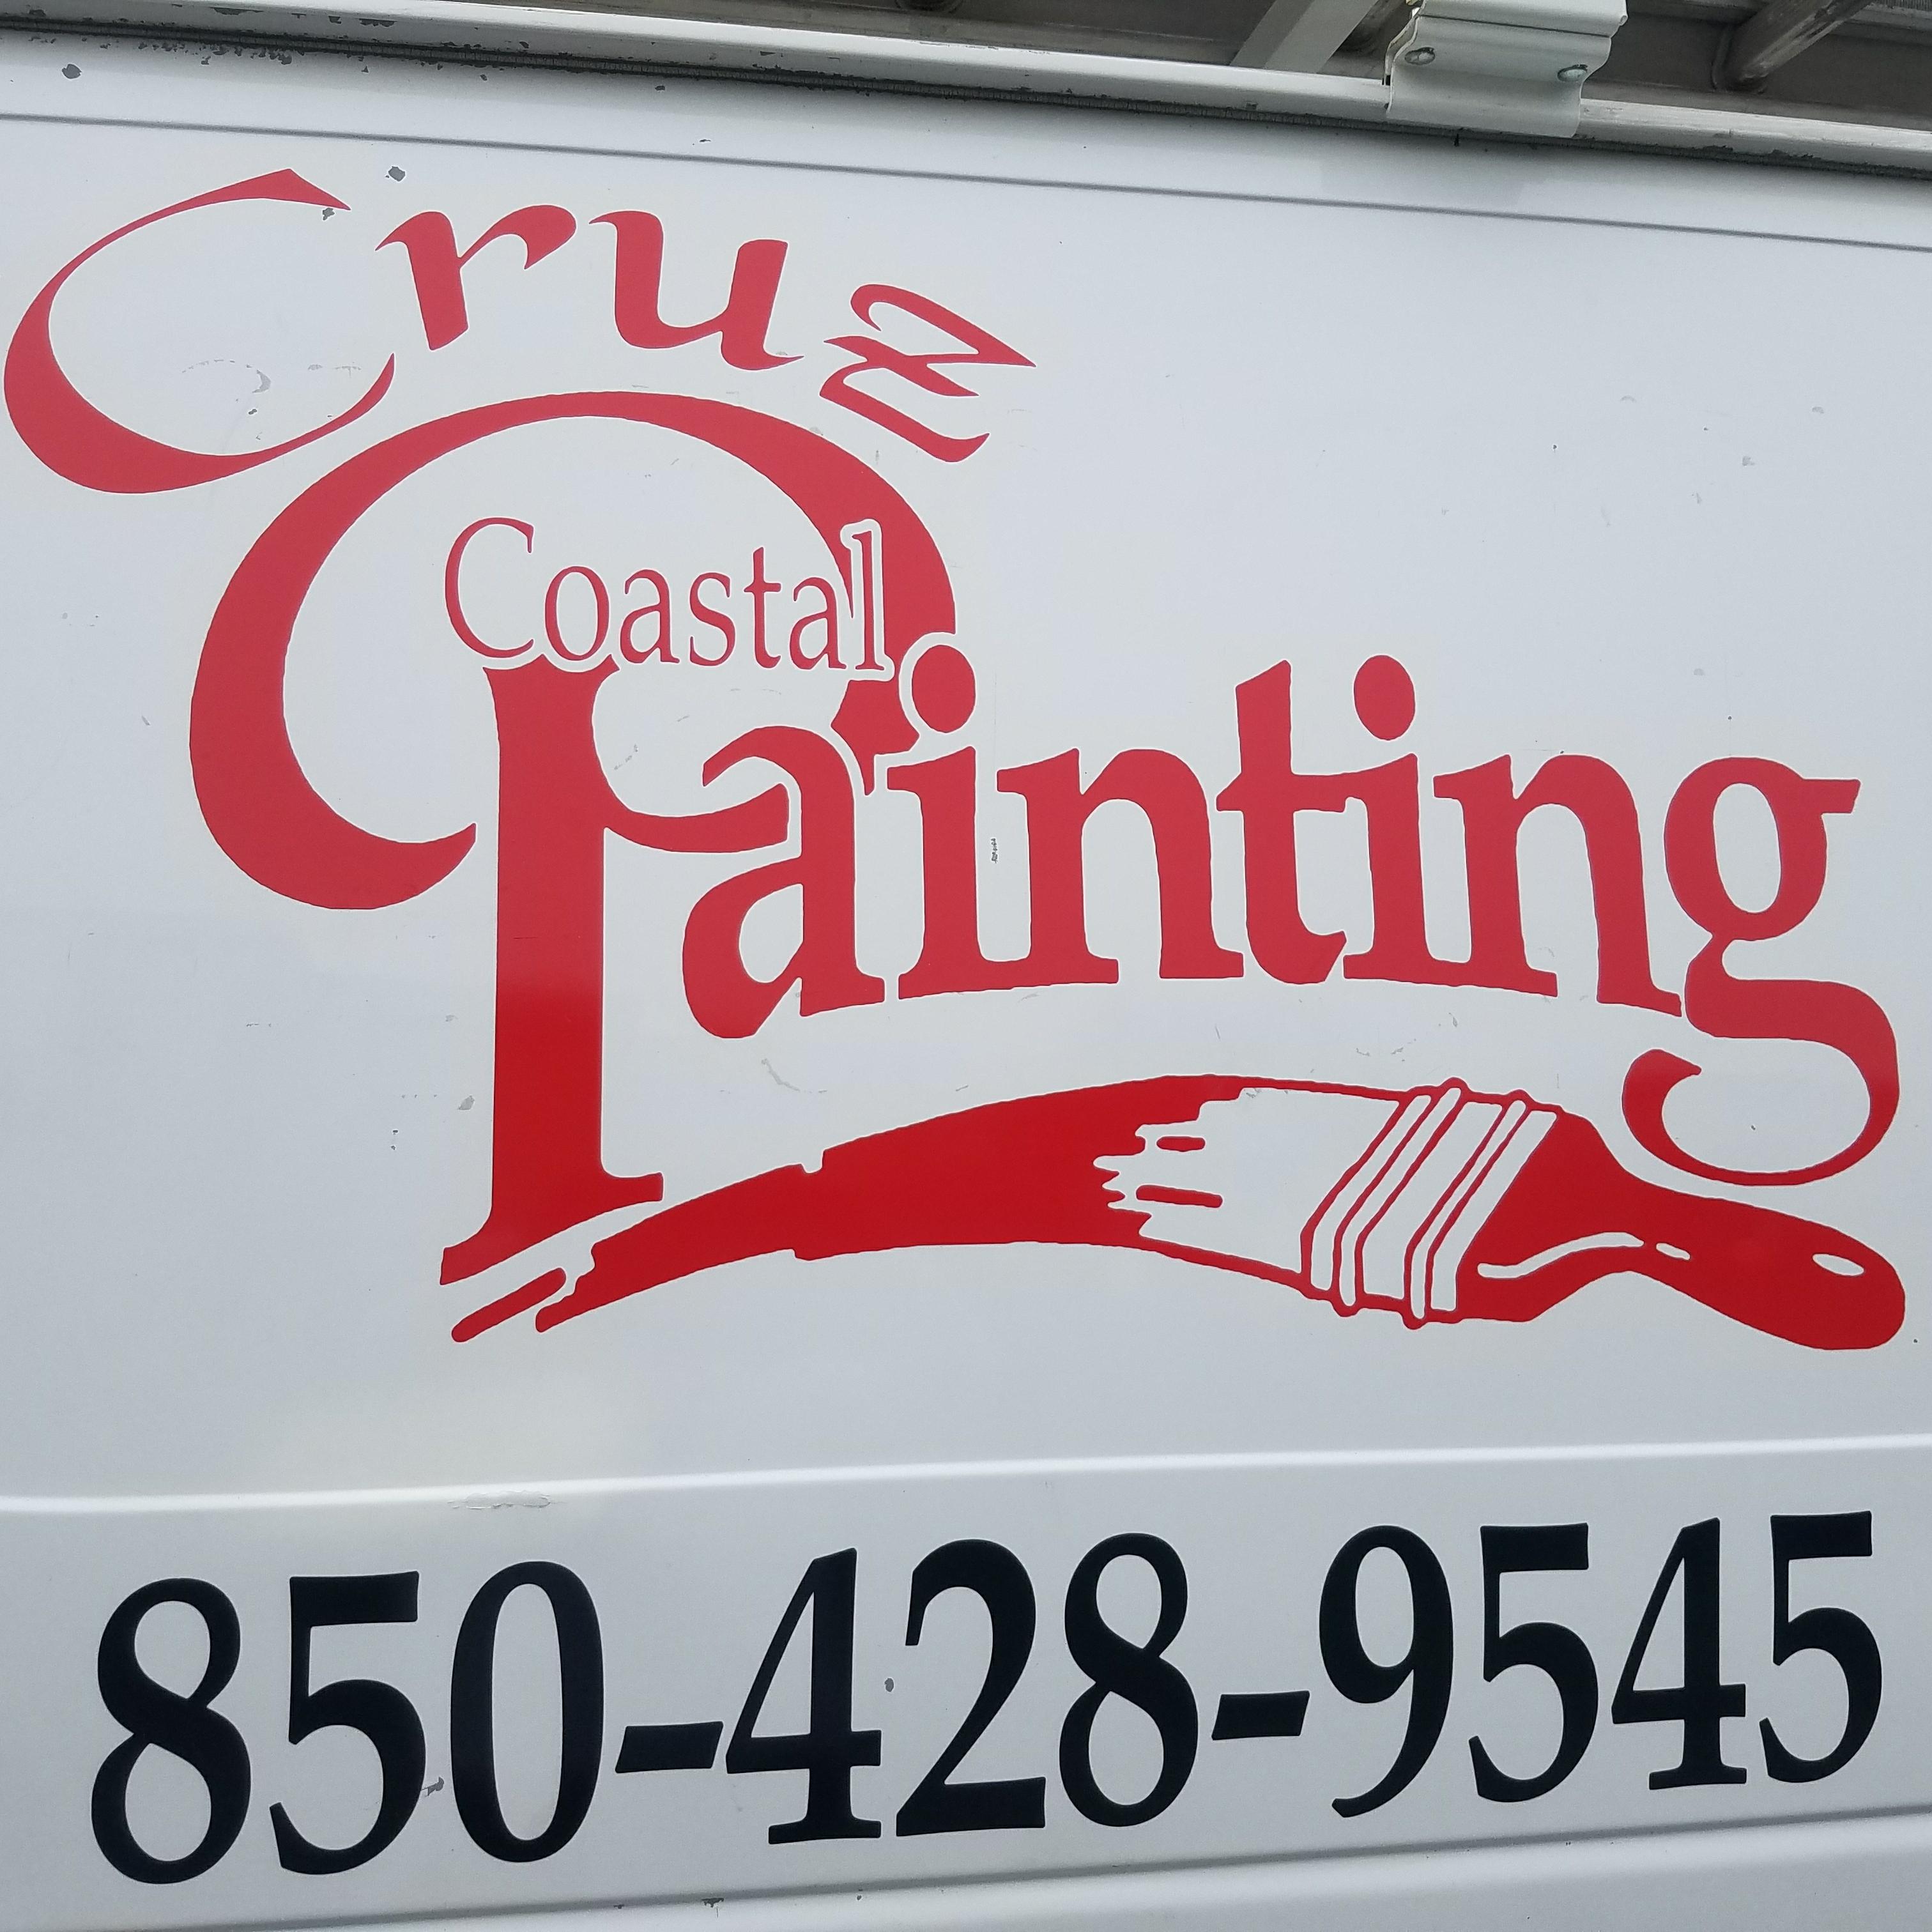 Cruz Coastal Painting LLC